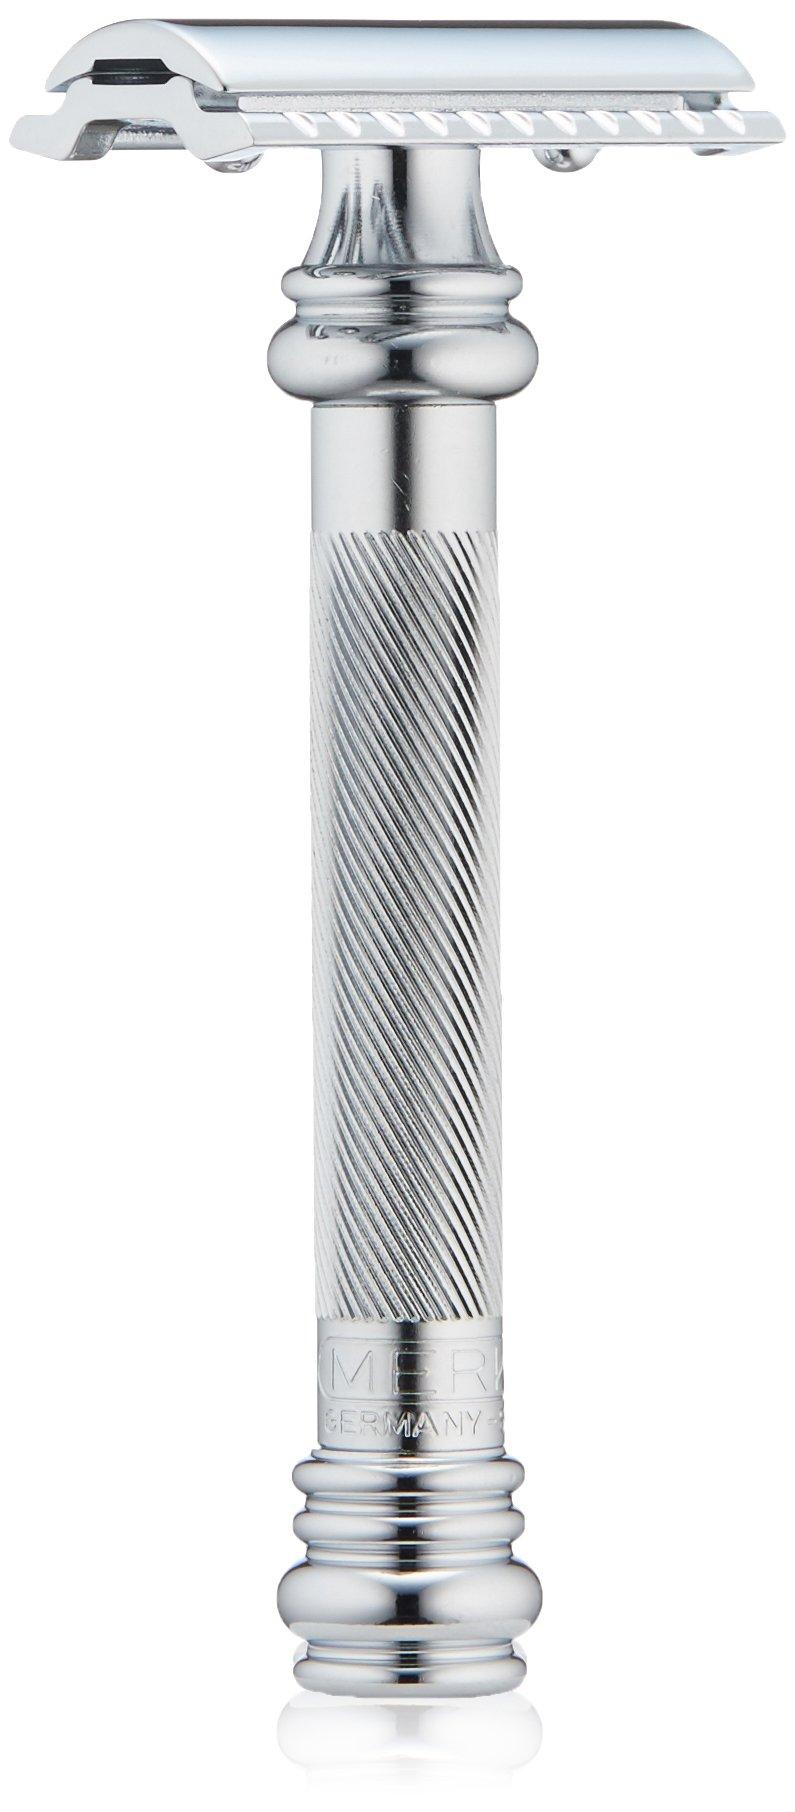 Merkur Heavy Duty Long Barber Pole Safety Razor, Chrome